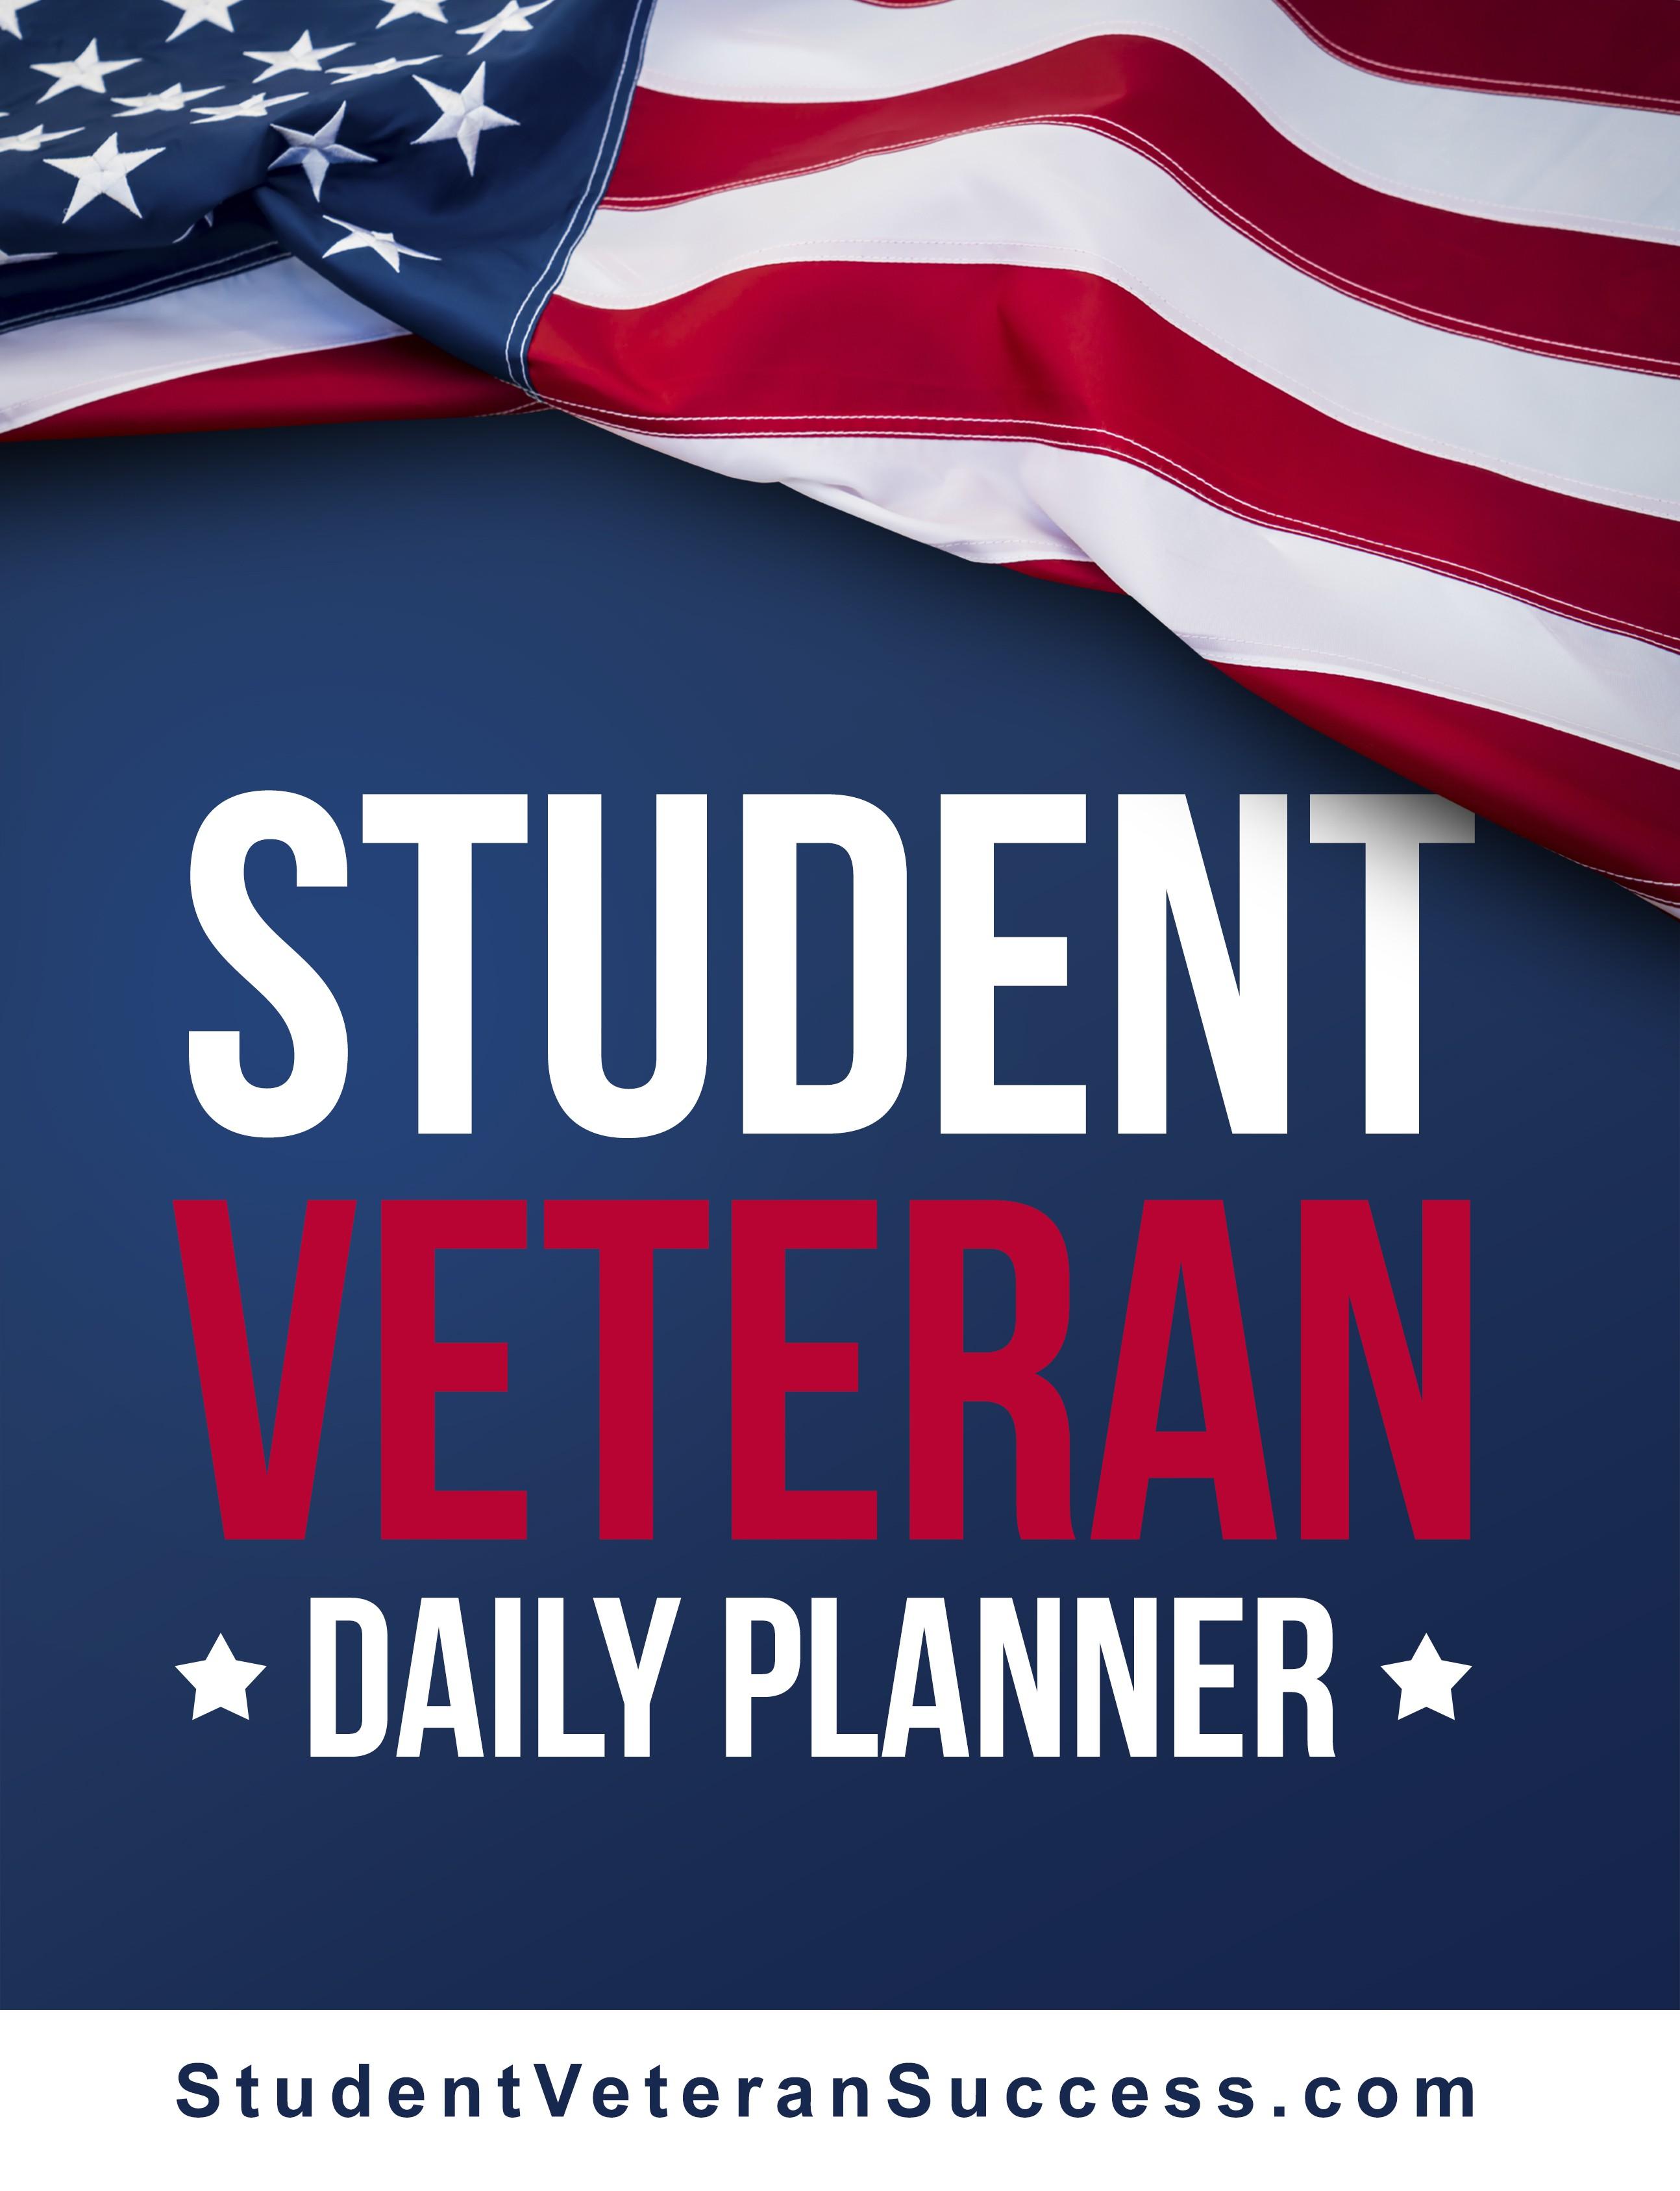 Student Veteran Daily Planner